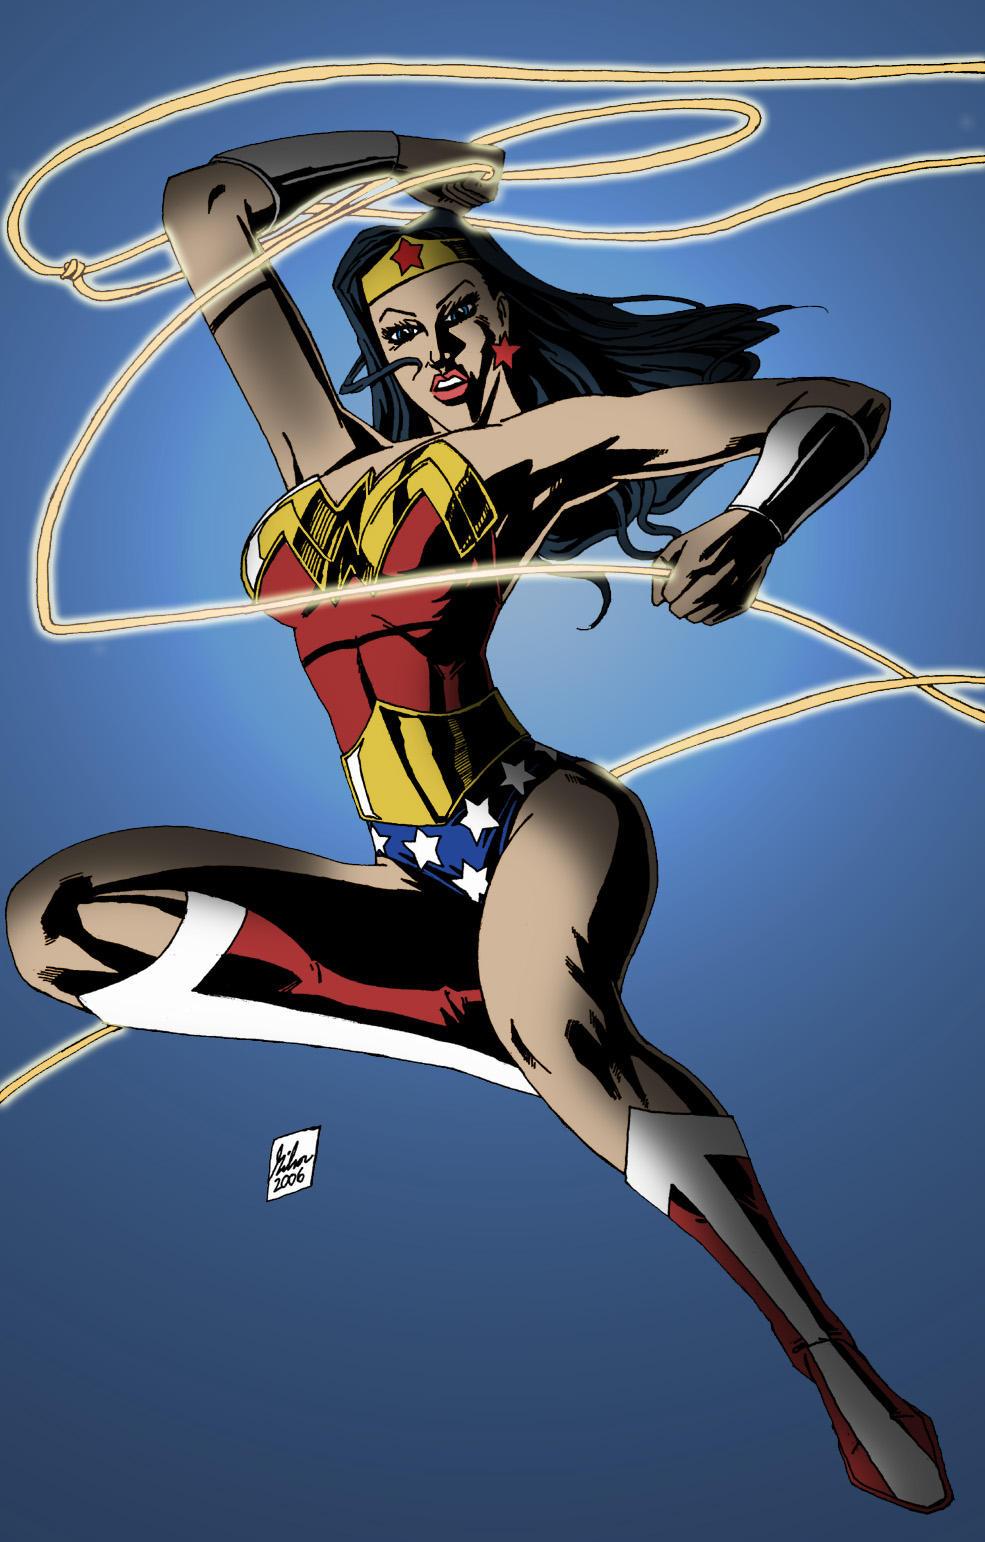 Wonder Woman lassoing